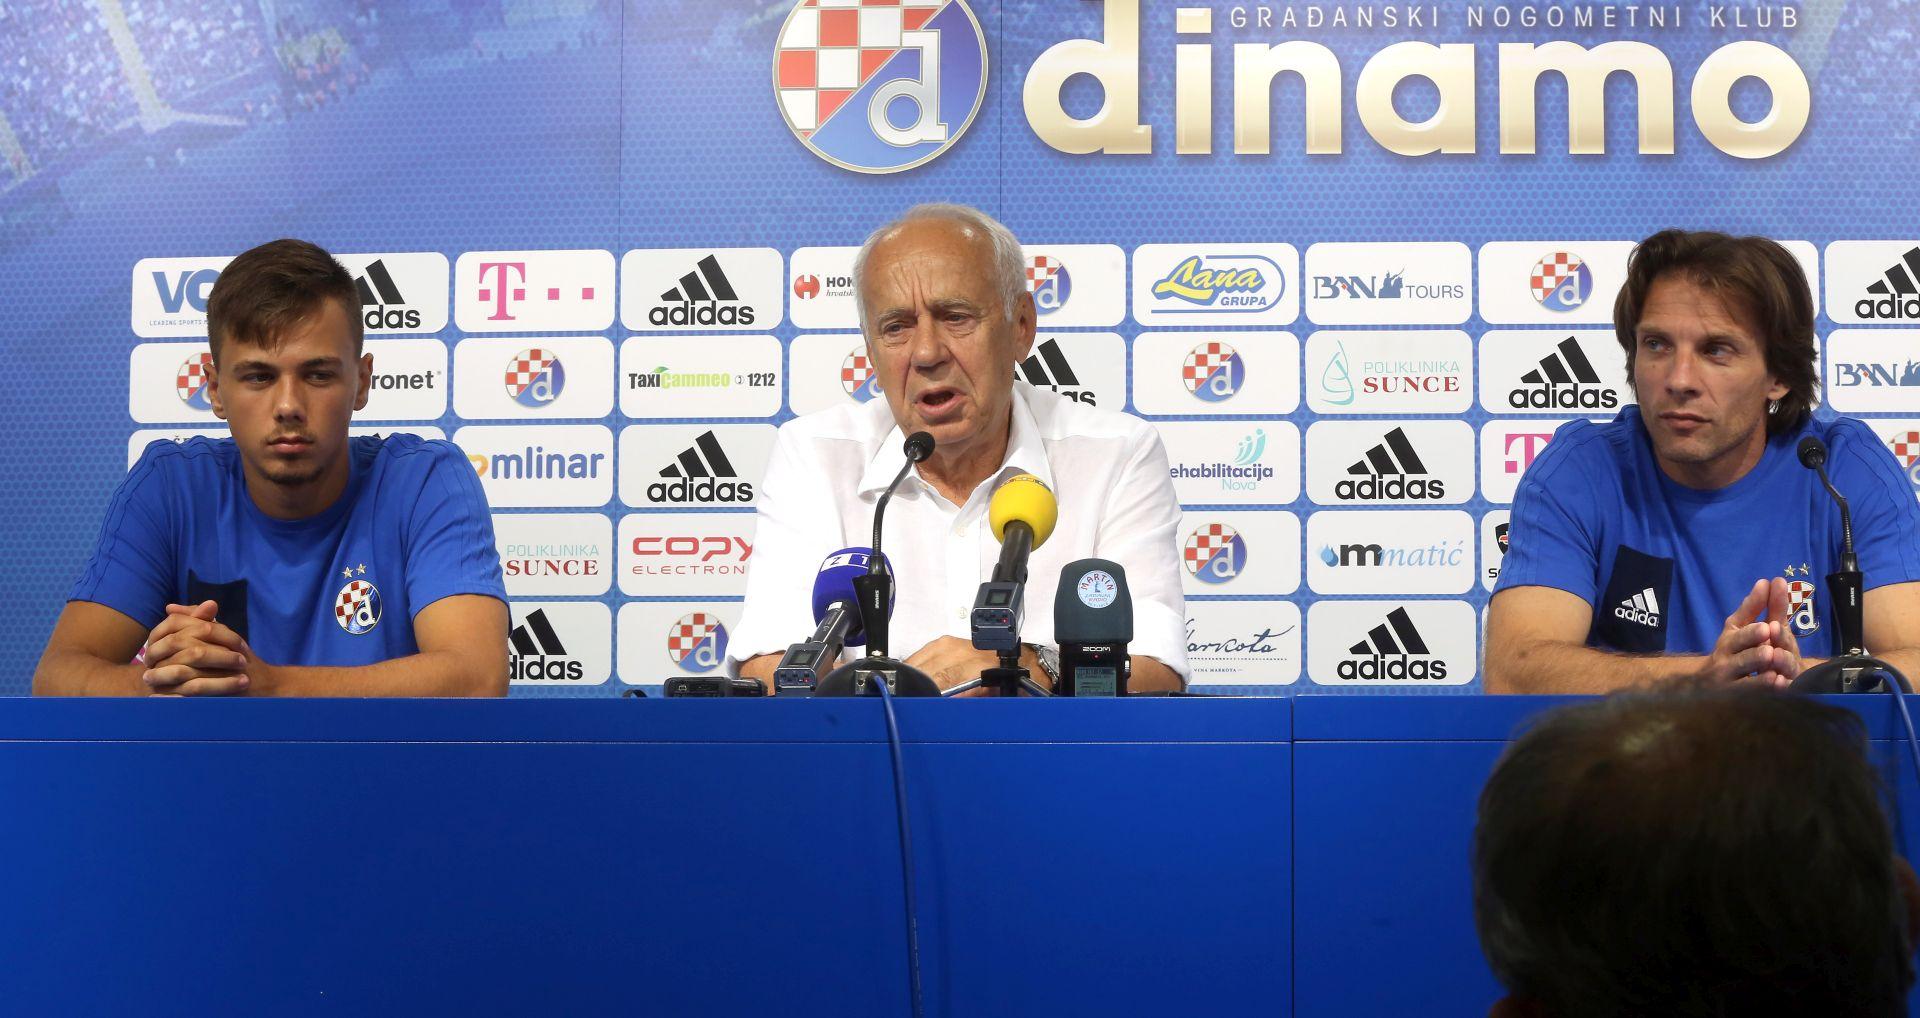 Uz Dinamo i Rijeku na turniru Mladena Ramljaka igrat će i juniori Reala, Eintrachta, Feyenoorda